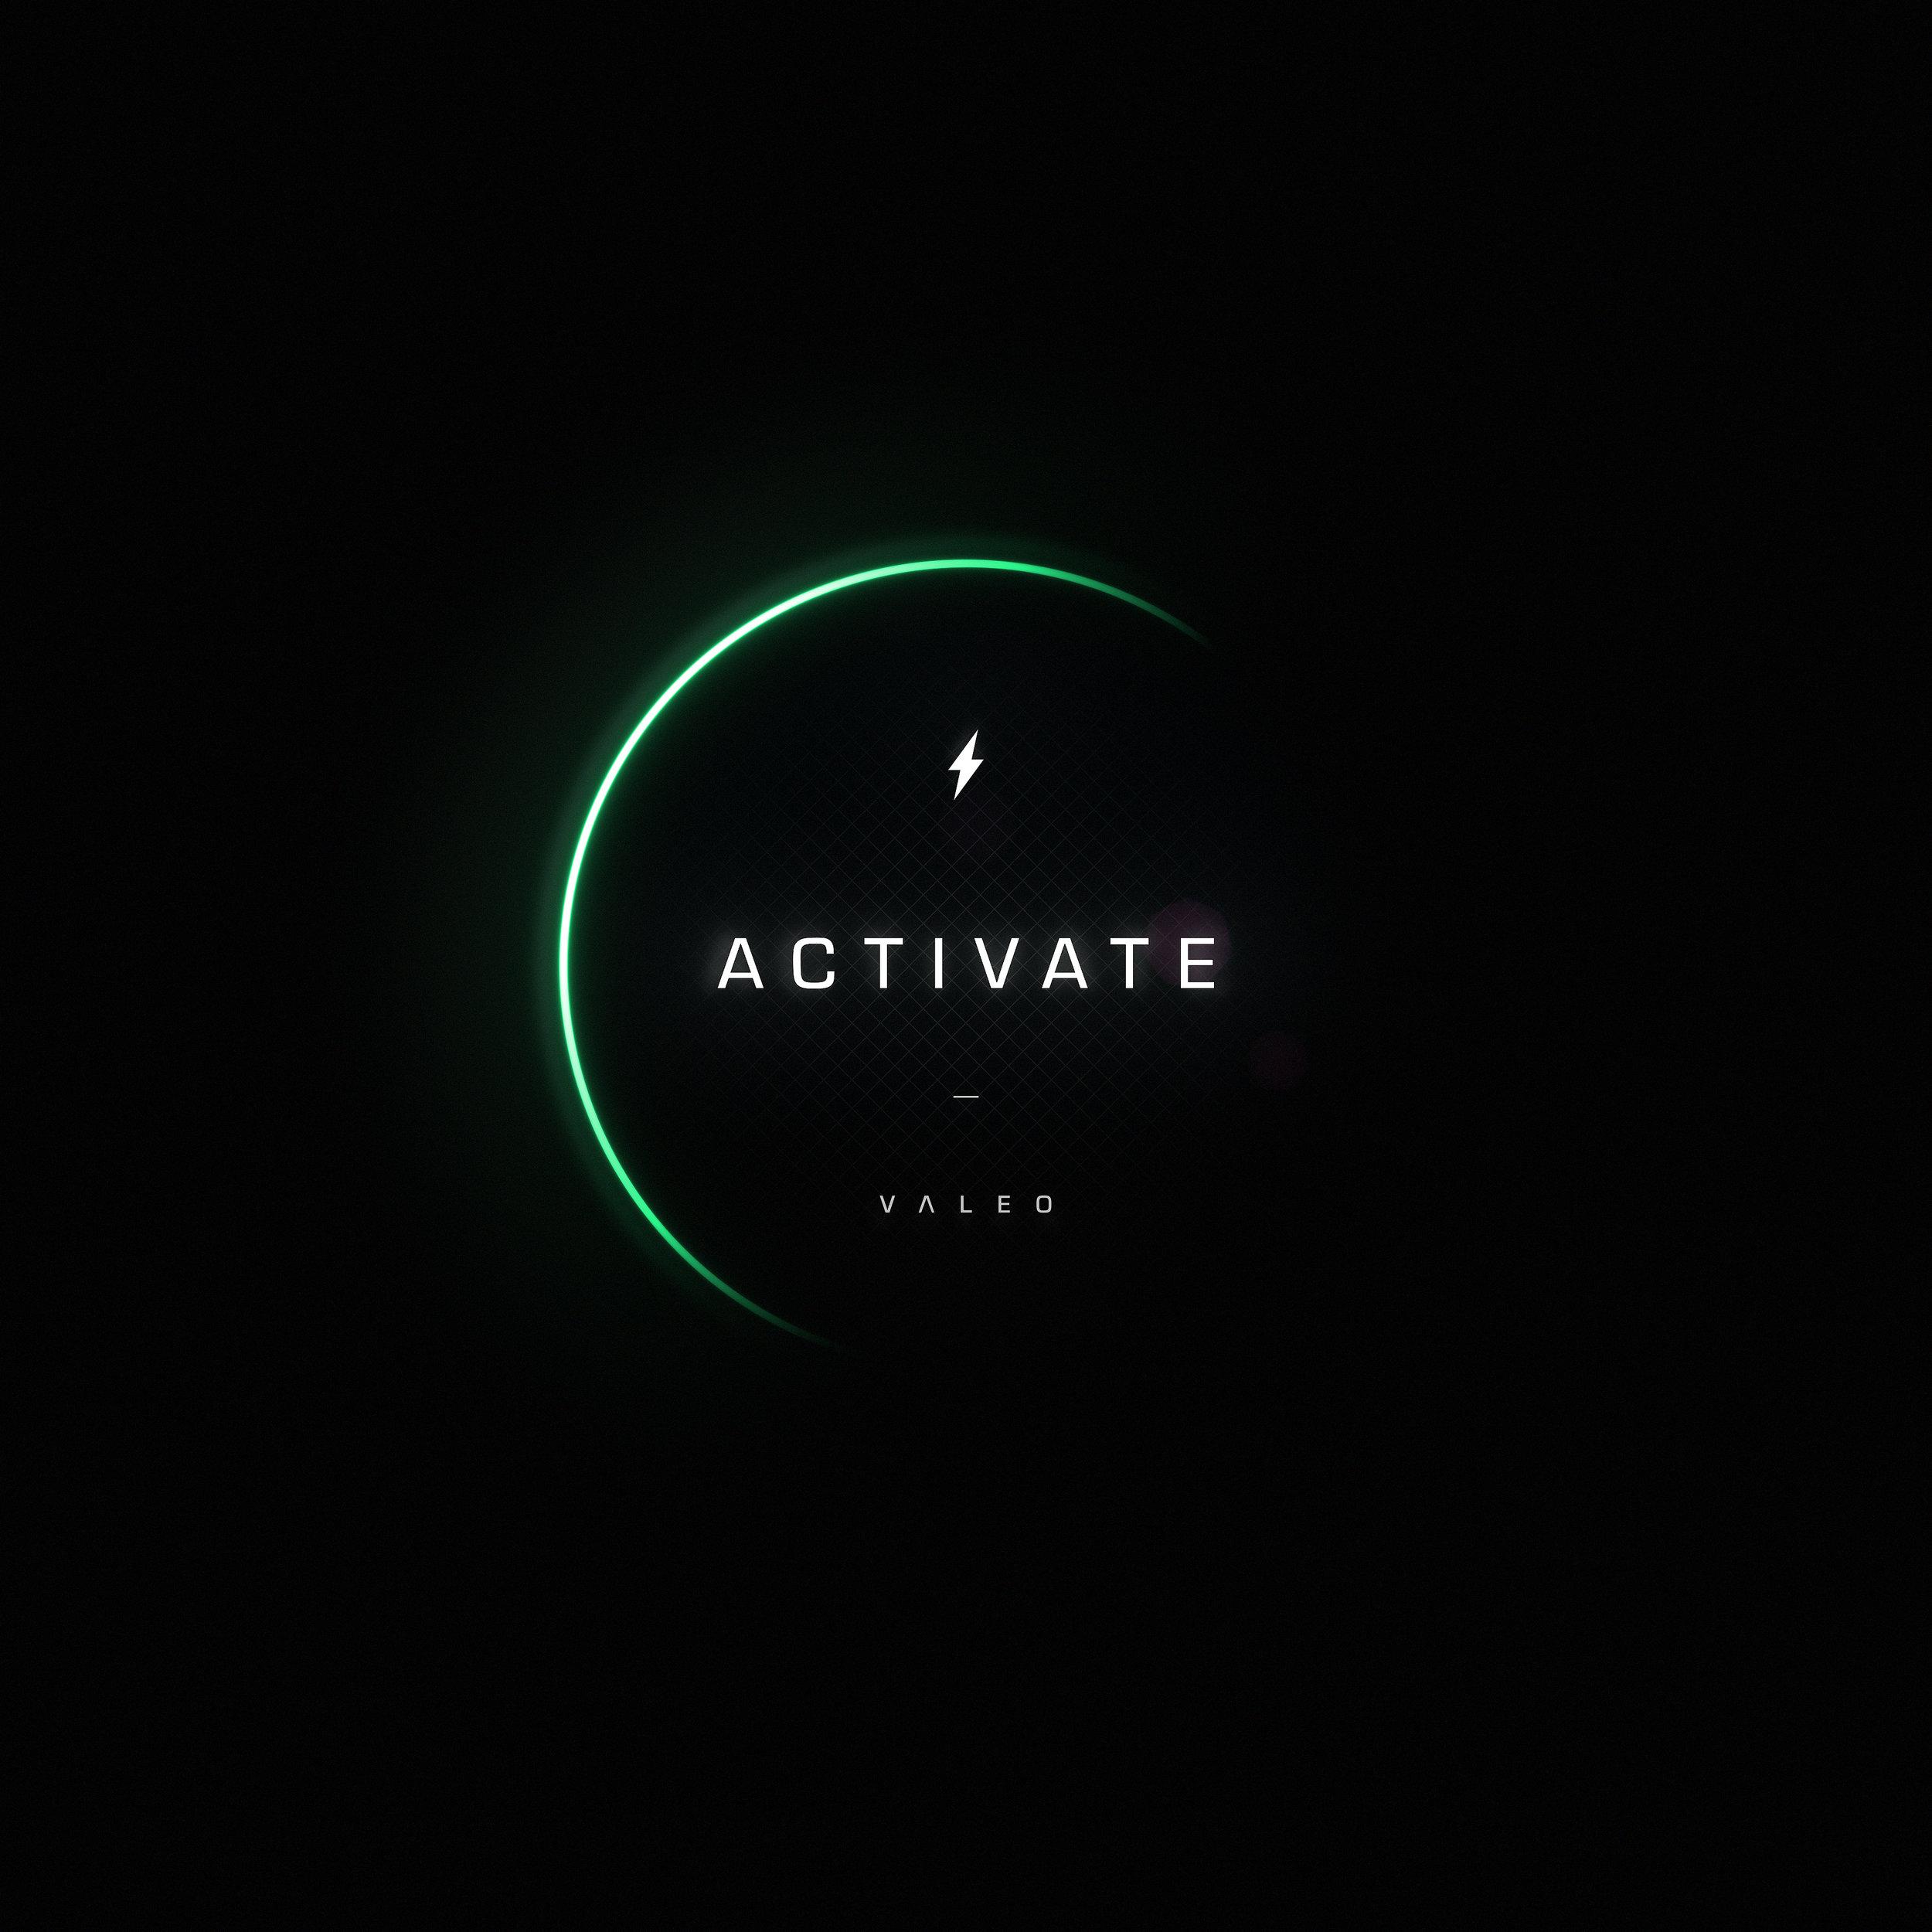 Valeo_Activate_01_Treated_01.jpg